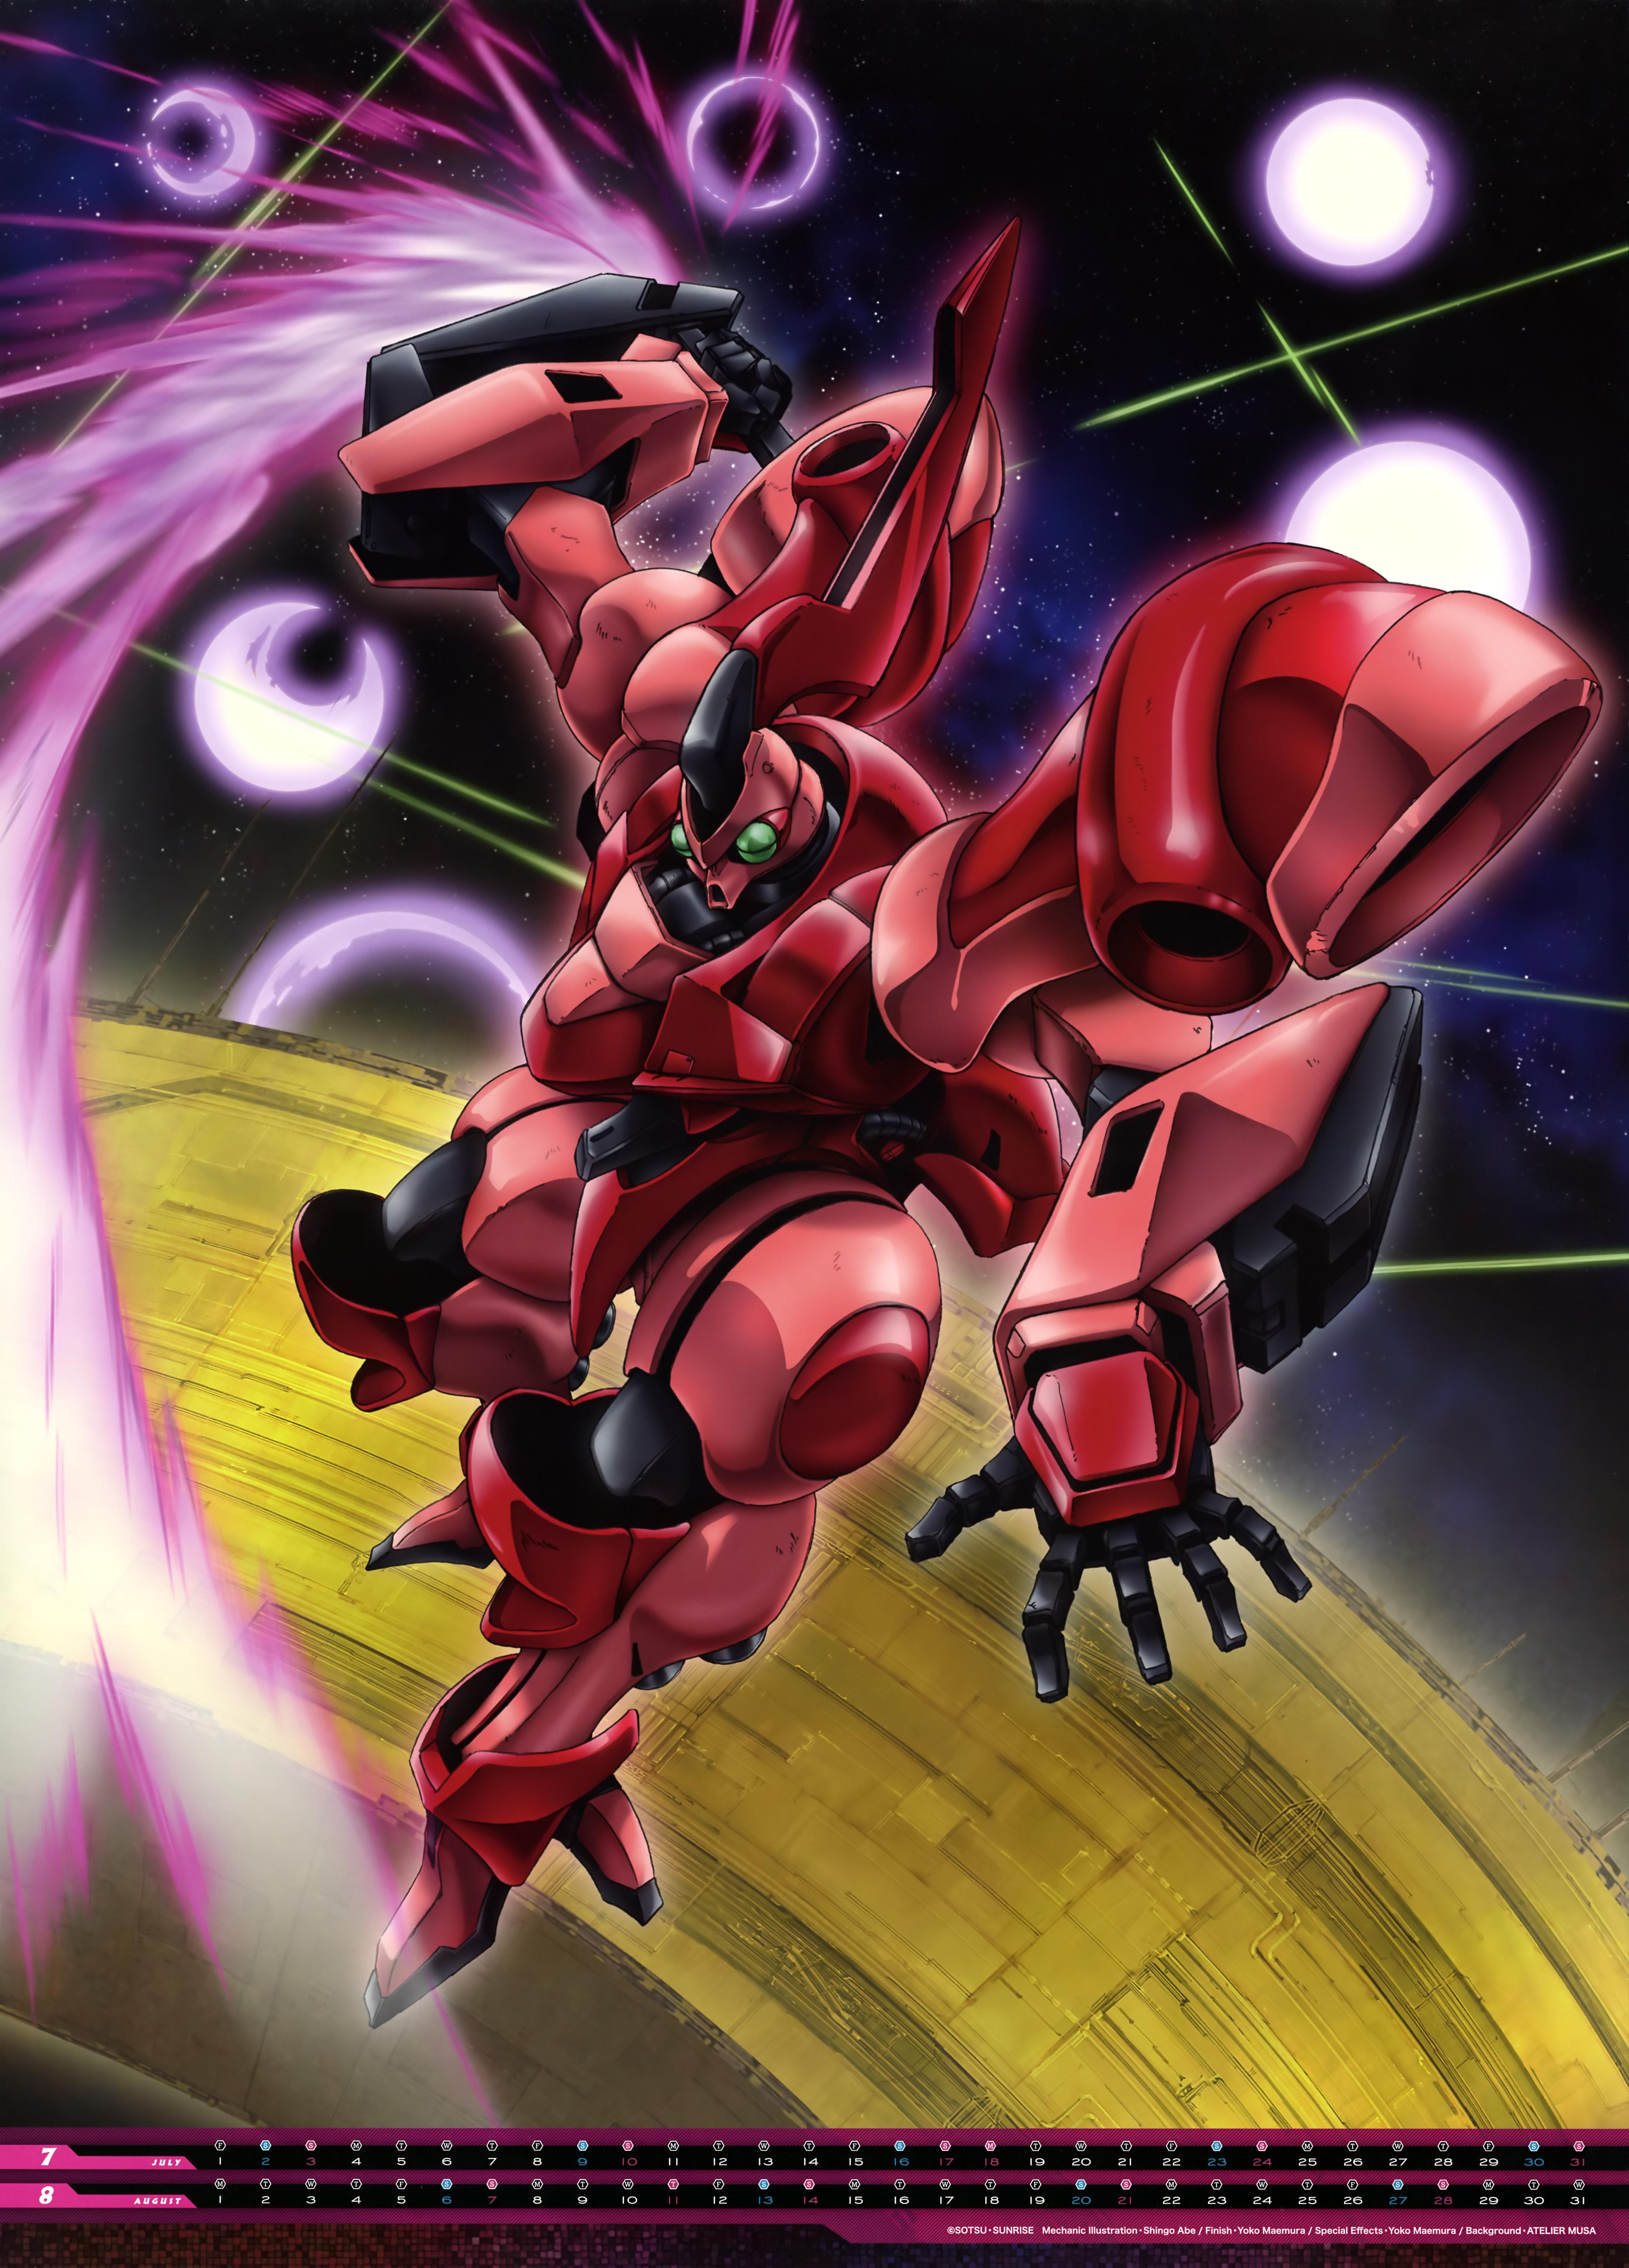 Mobile Suit Gundam Series anime Calendar 2016 0005